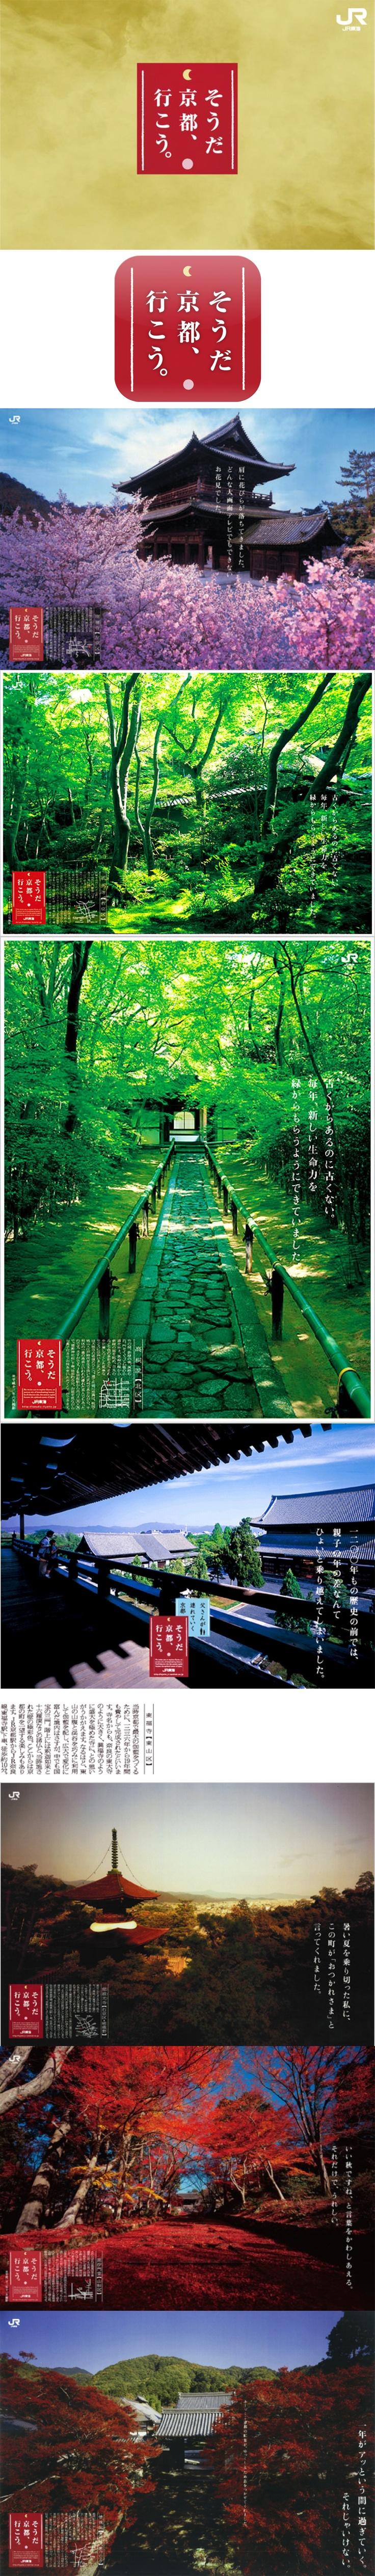 @JR @そうだ京都、行こう。@旅行代理業 @制作:佐々木宏 @wiki/http://ja.wikipedia.org/wiki/そうだ_京都、行こう。@http://souda-kyoto.jp/campain/